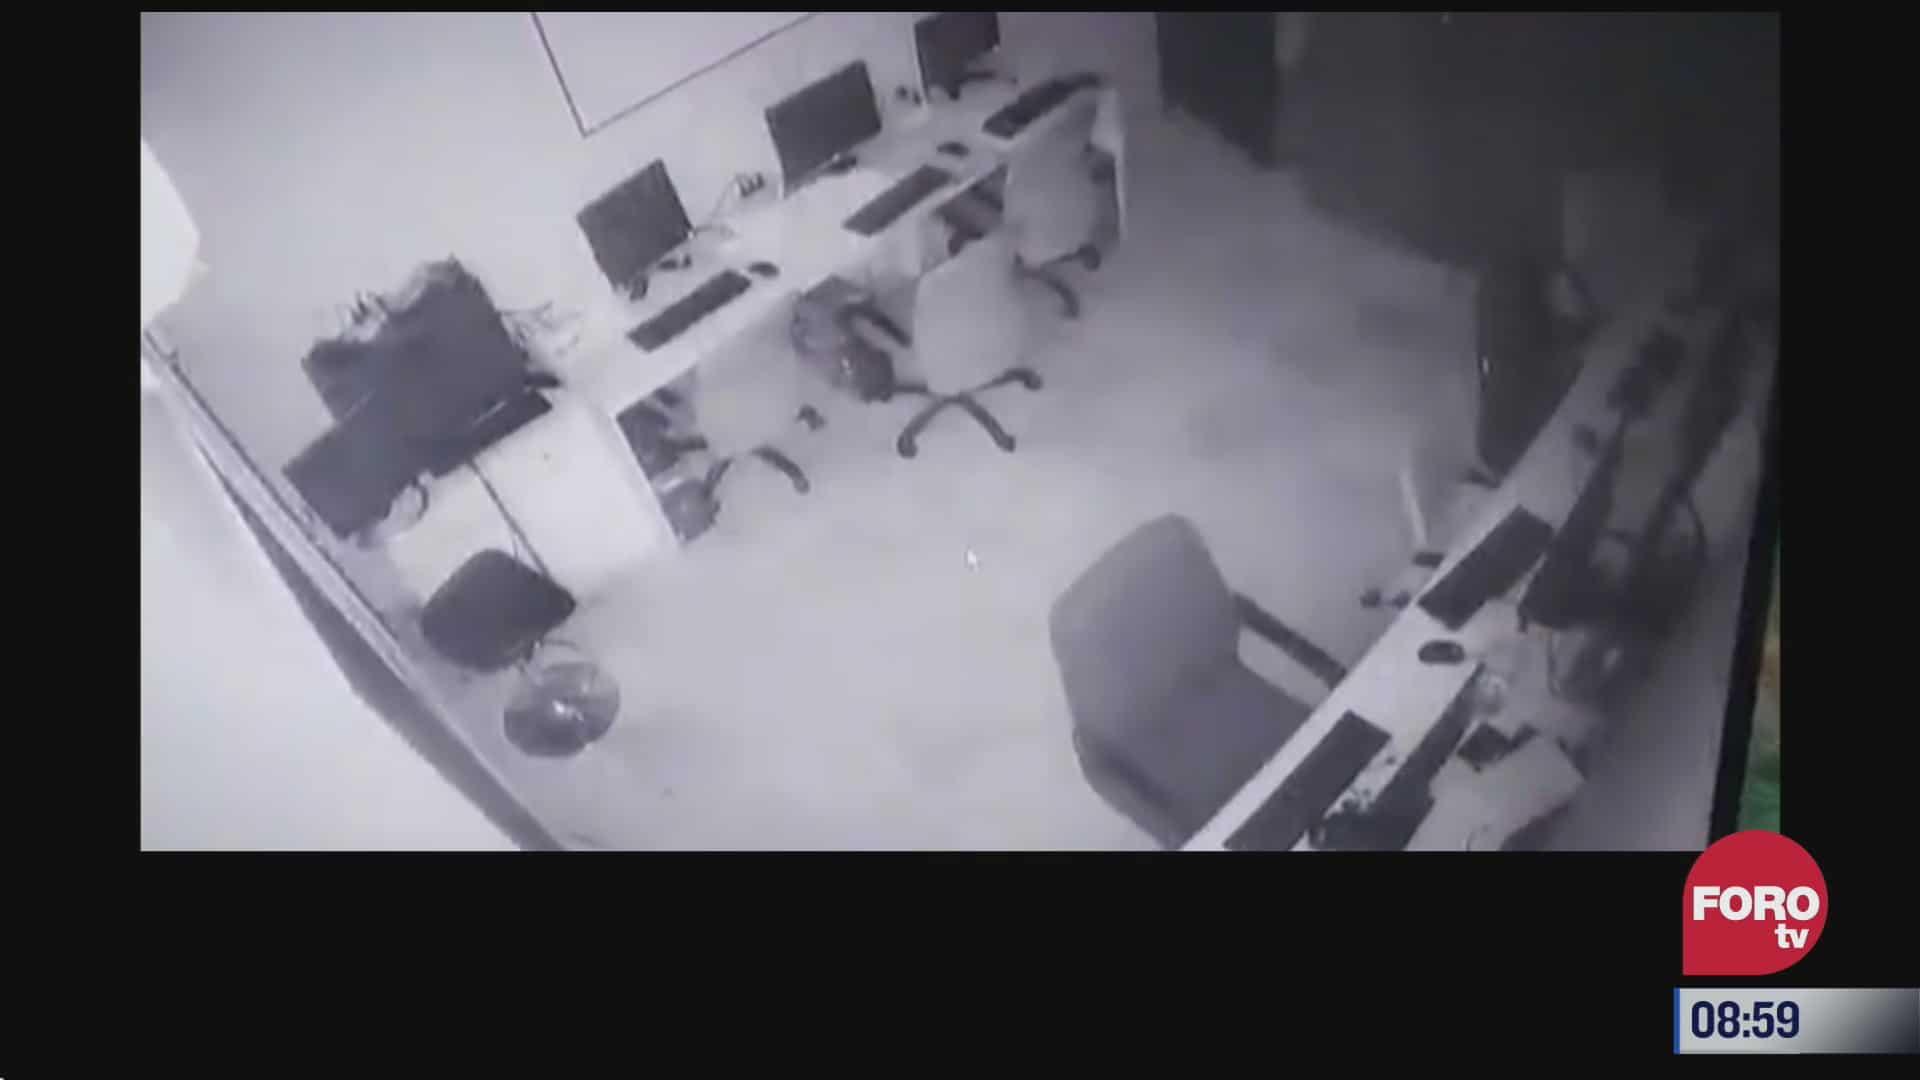 momento exacto en que silla se mueve sola en oficinas